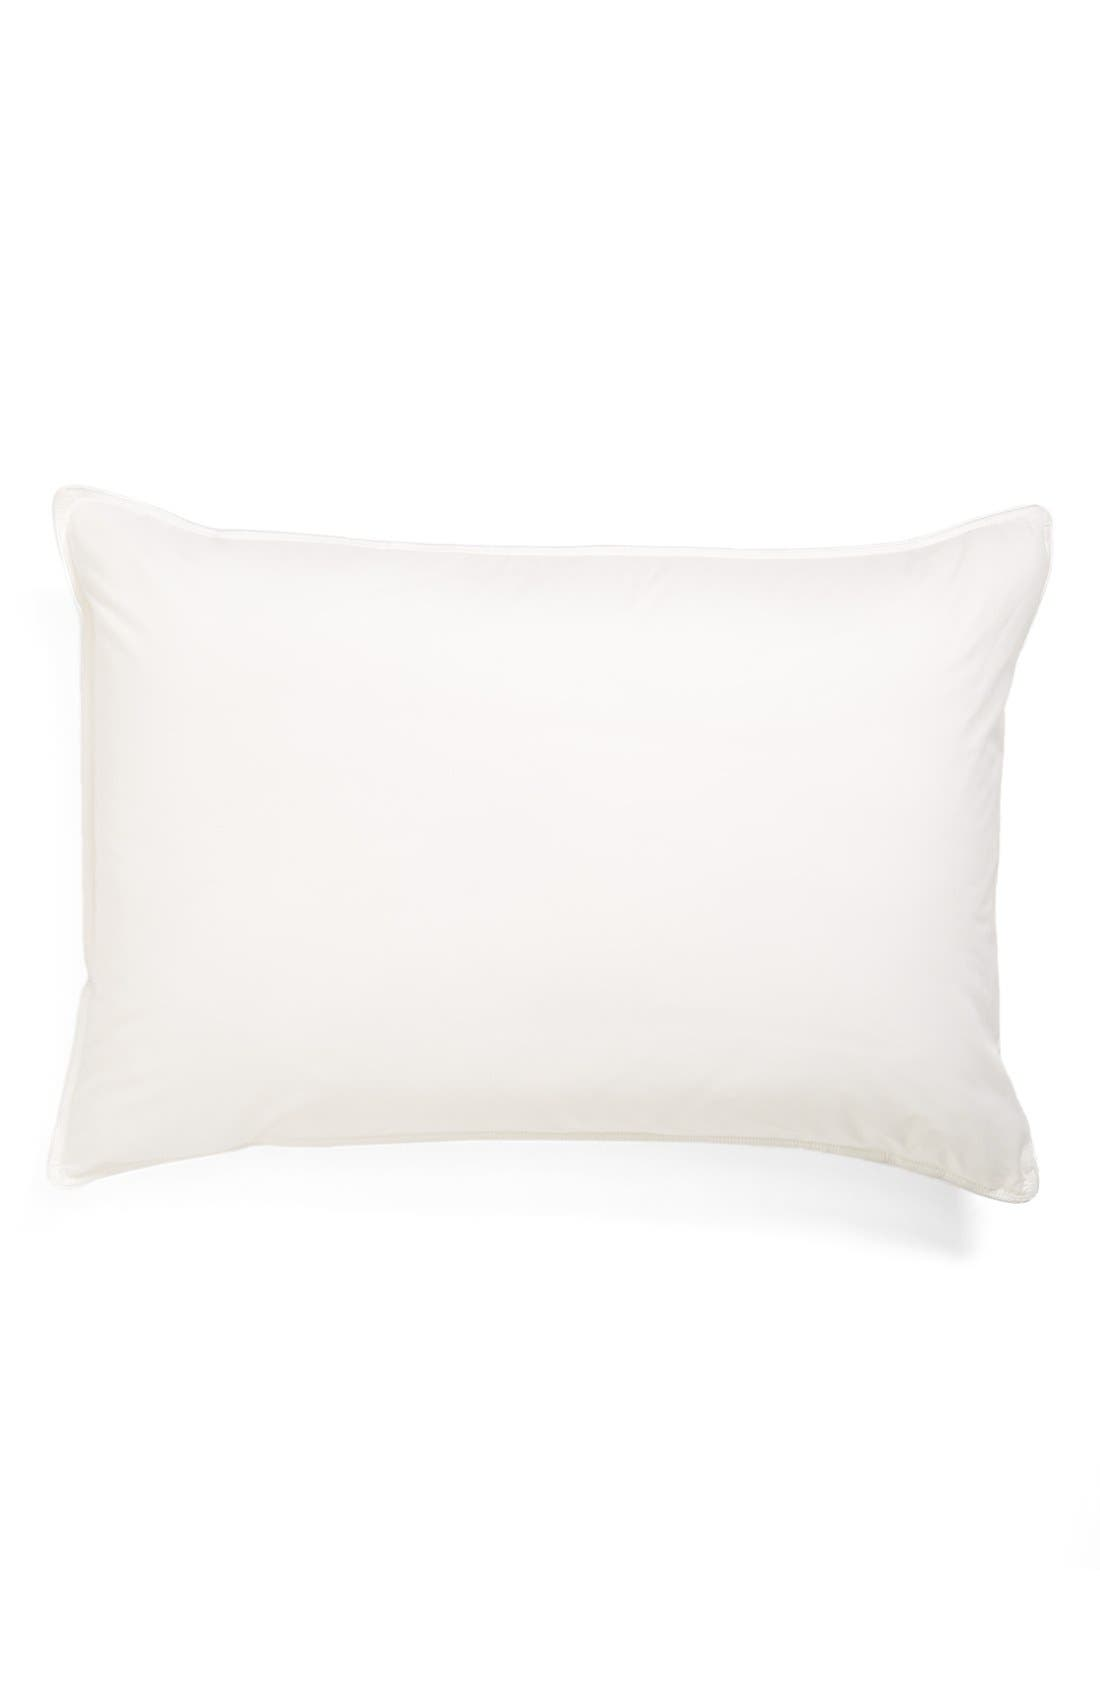 Alternate Image 1 Selected - Nordstrom at Home Memory Foam Core Pillow